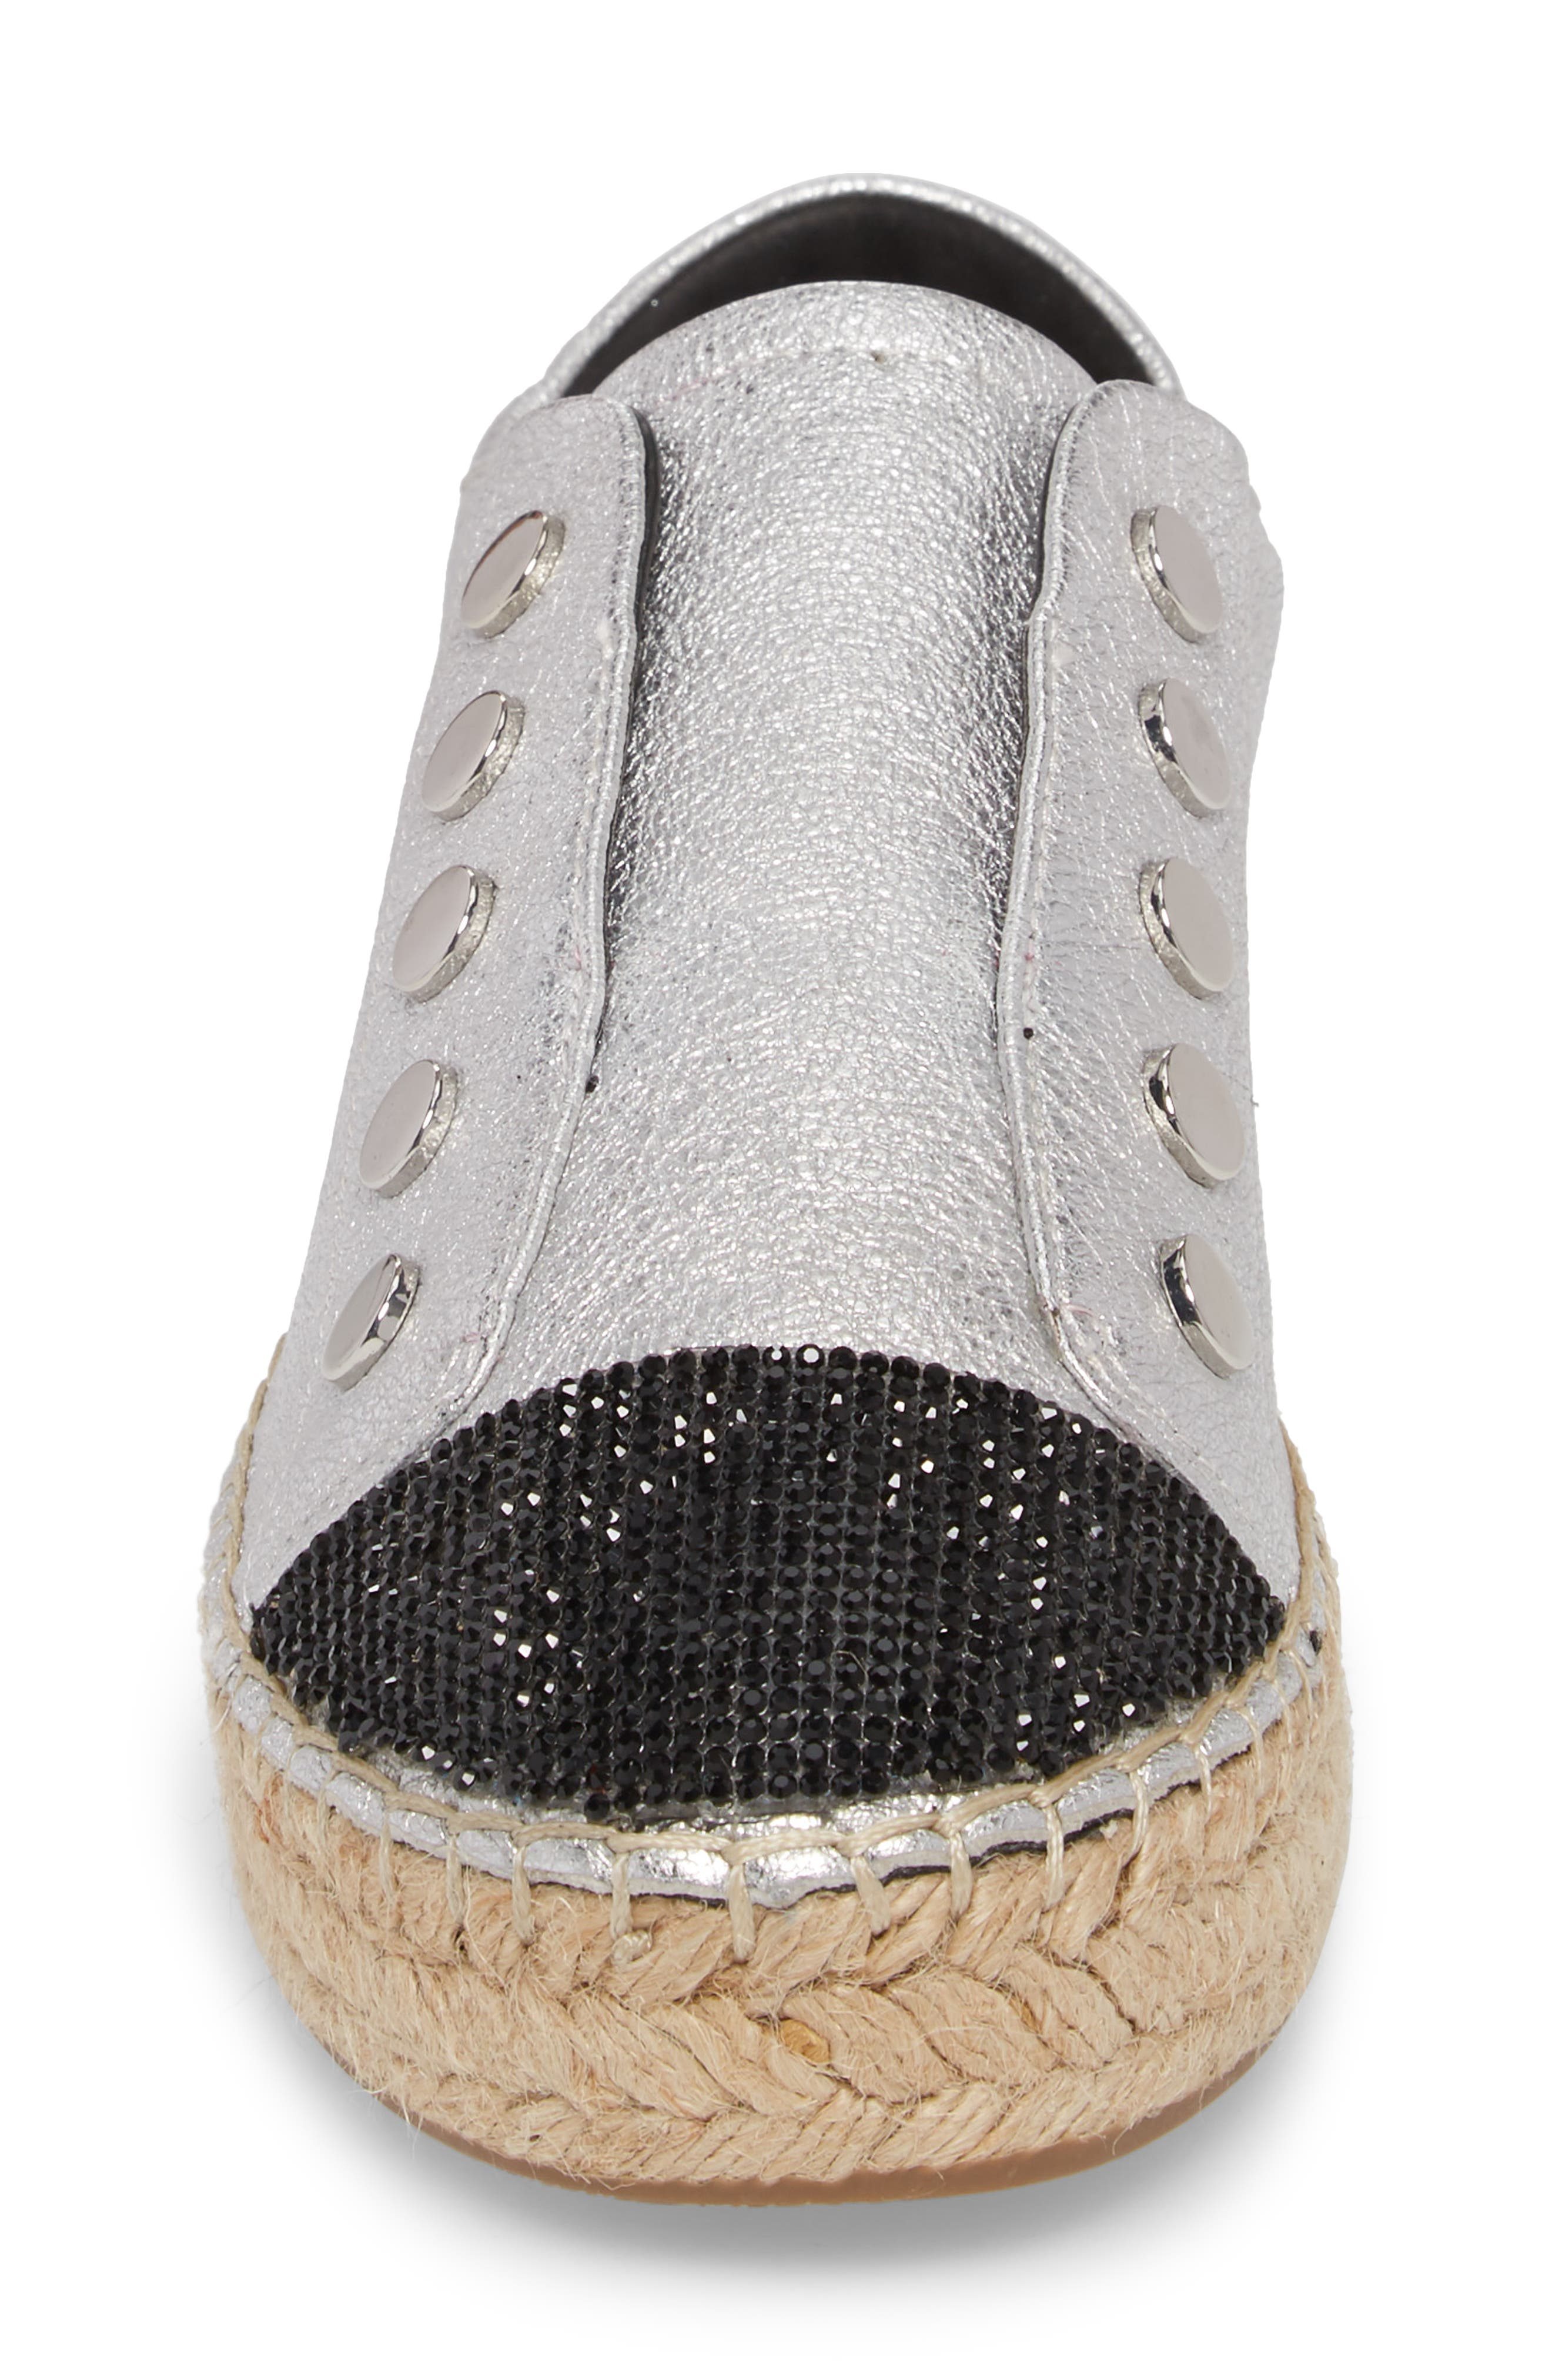 Juniper Espadrille Sneaker,                             Alternate thumbnail 4, color,                             SILVER